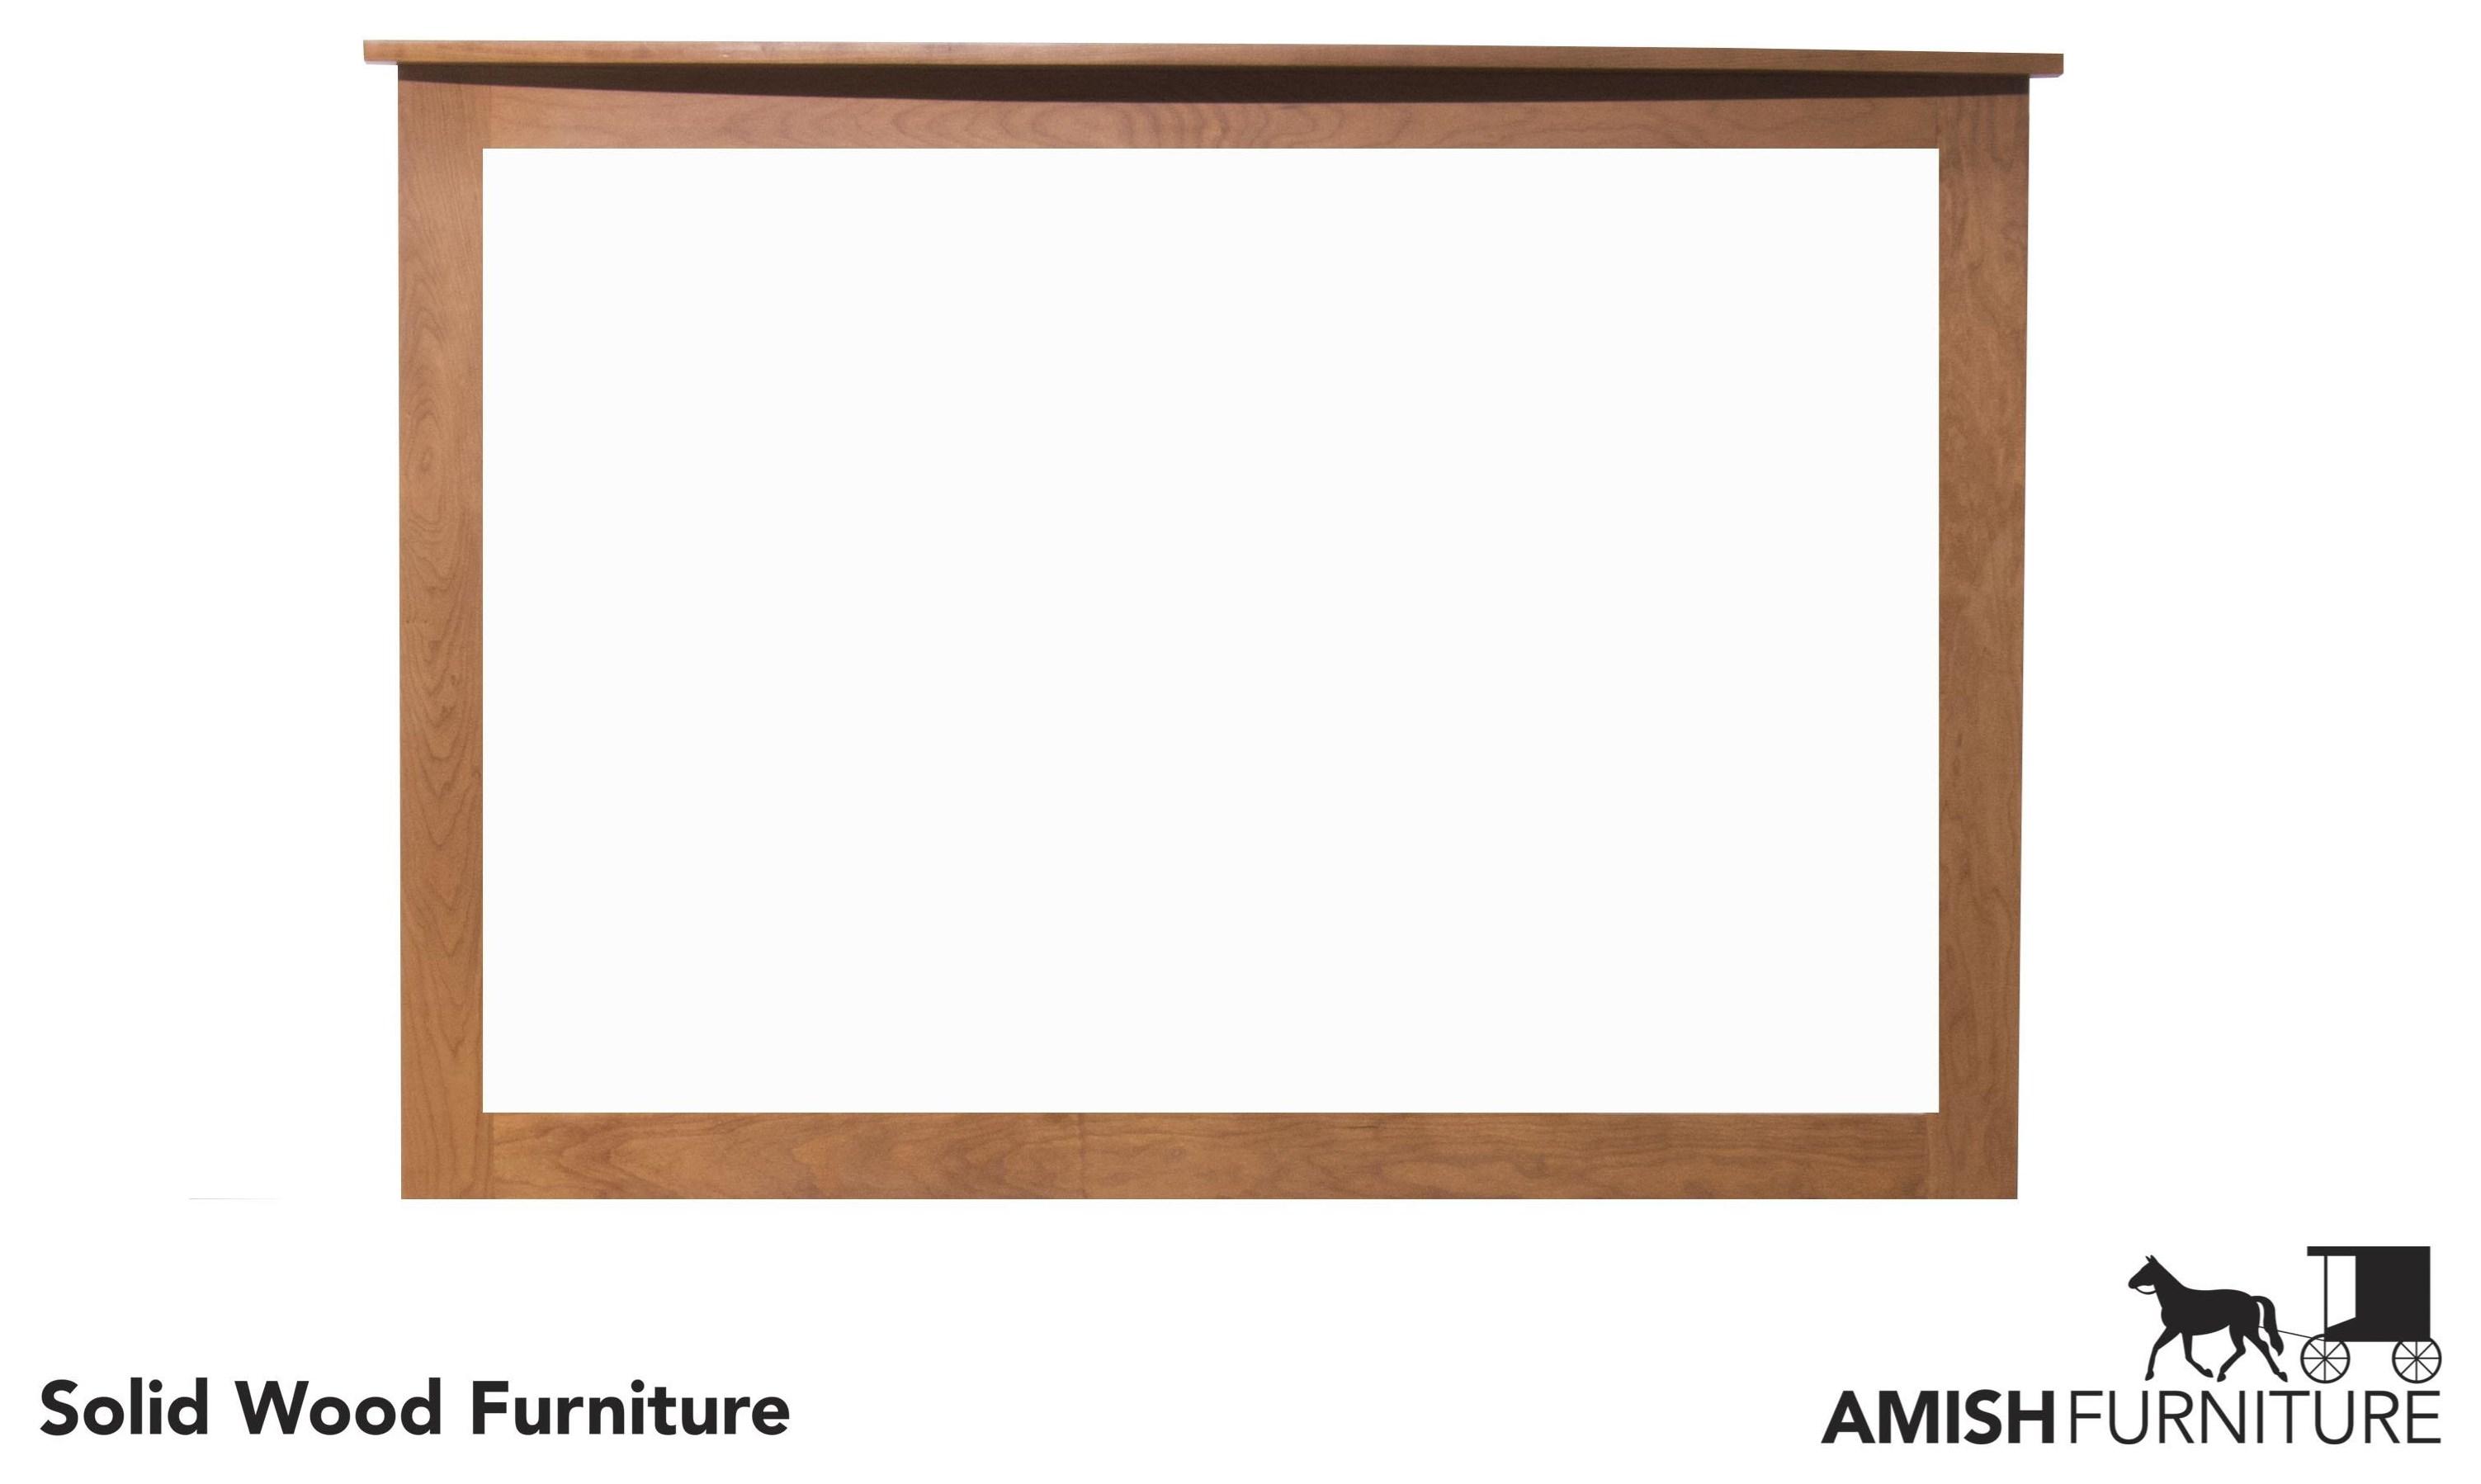 Bedfort DA Amish Dresser Mirror by Daniel's Amish at Ruby Gordon Home